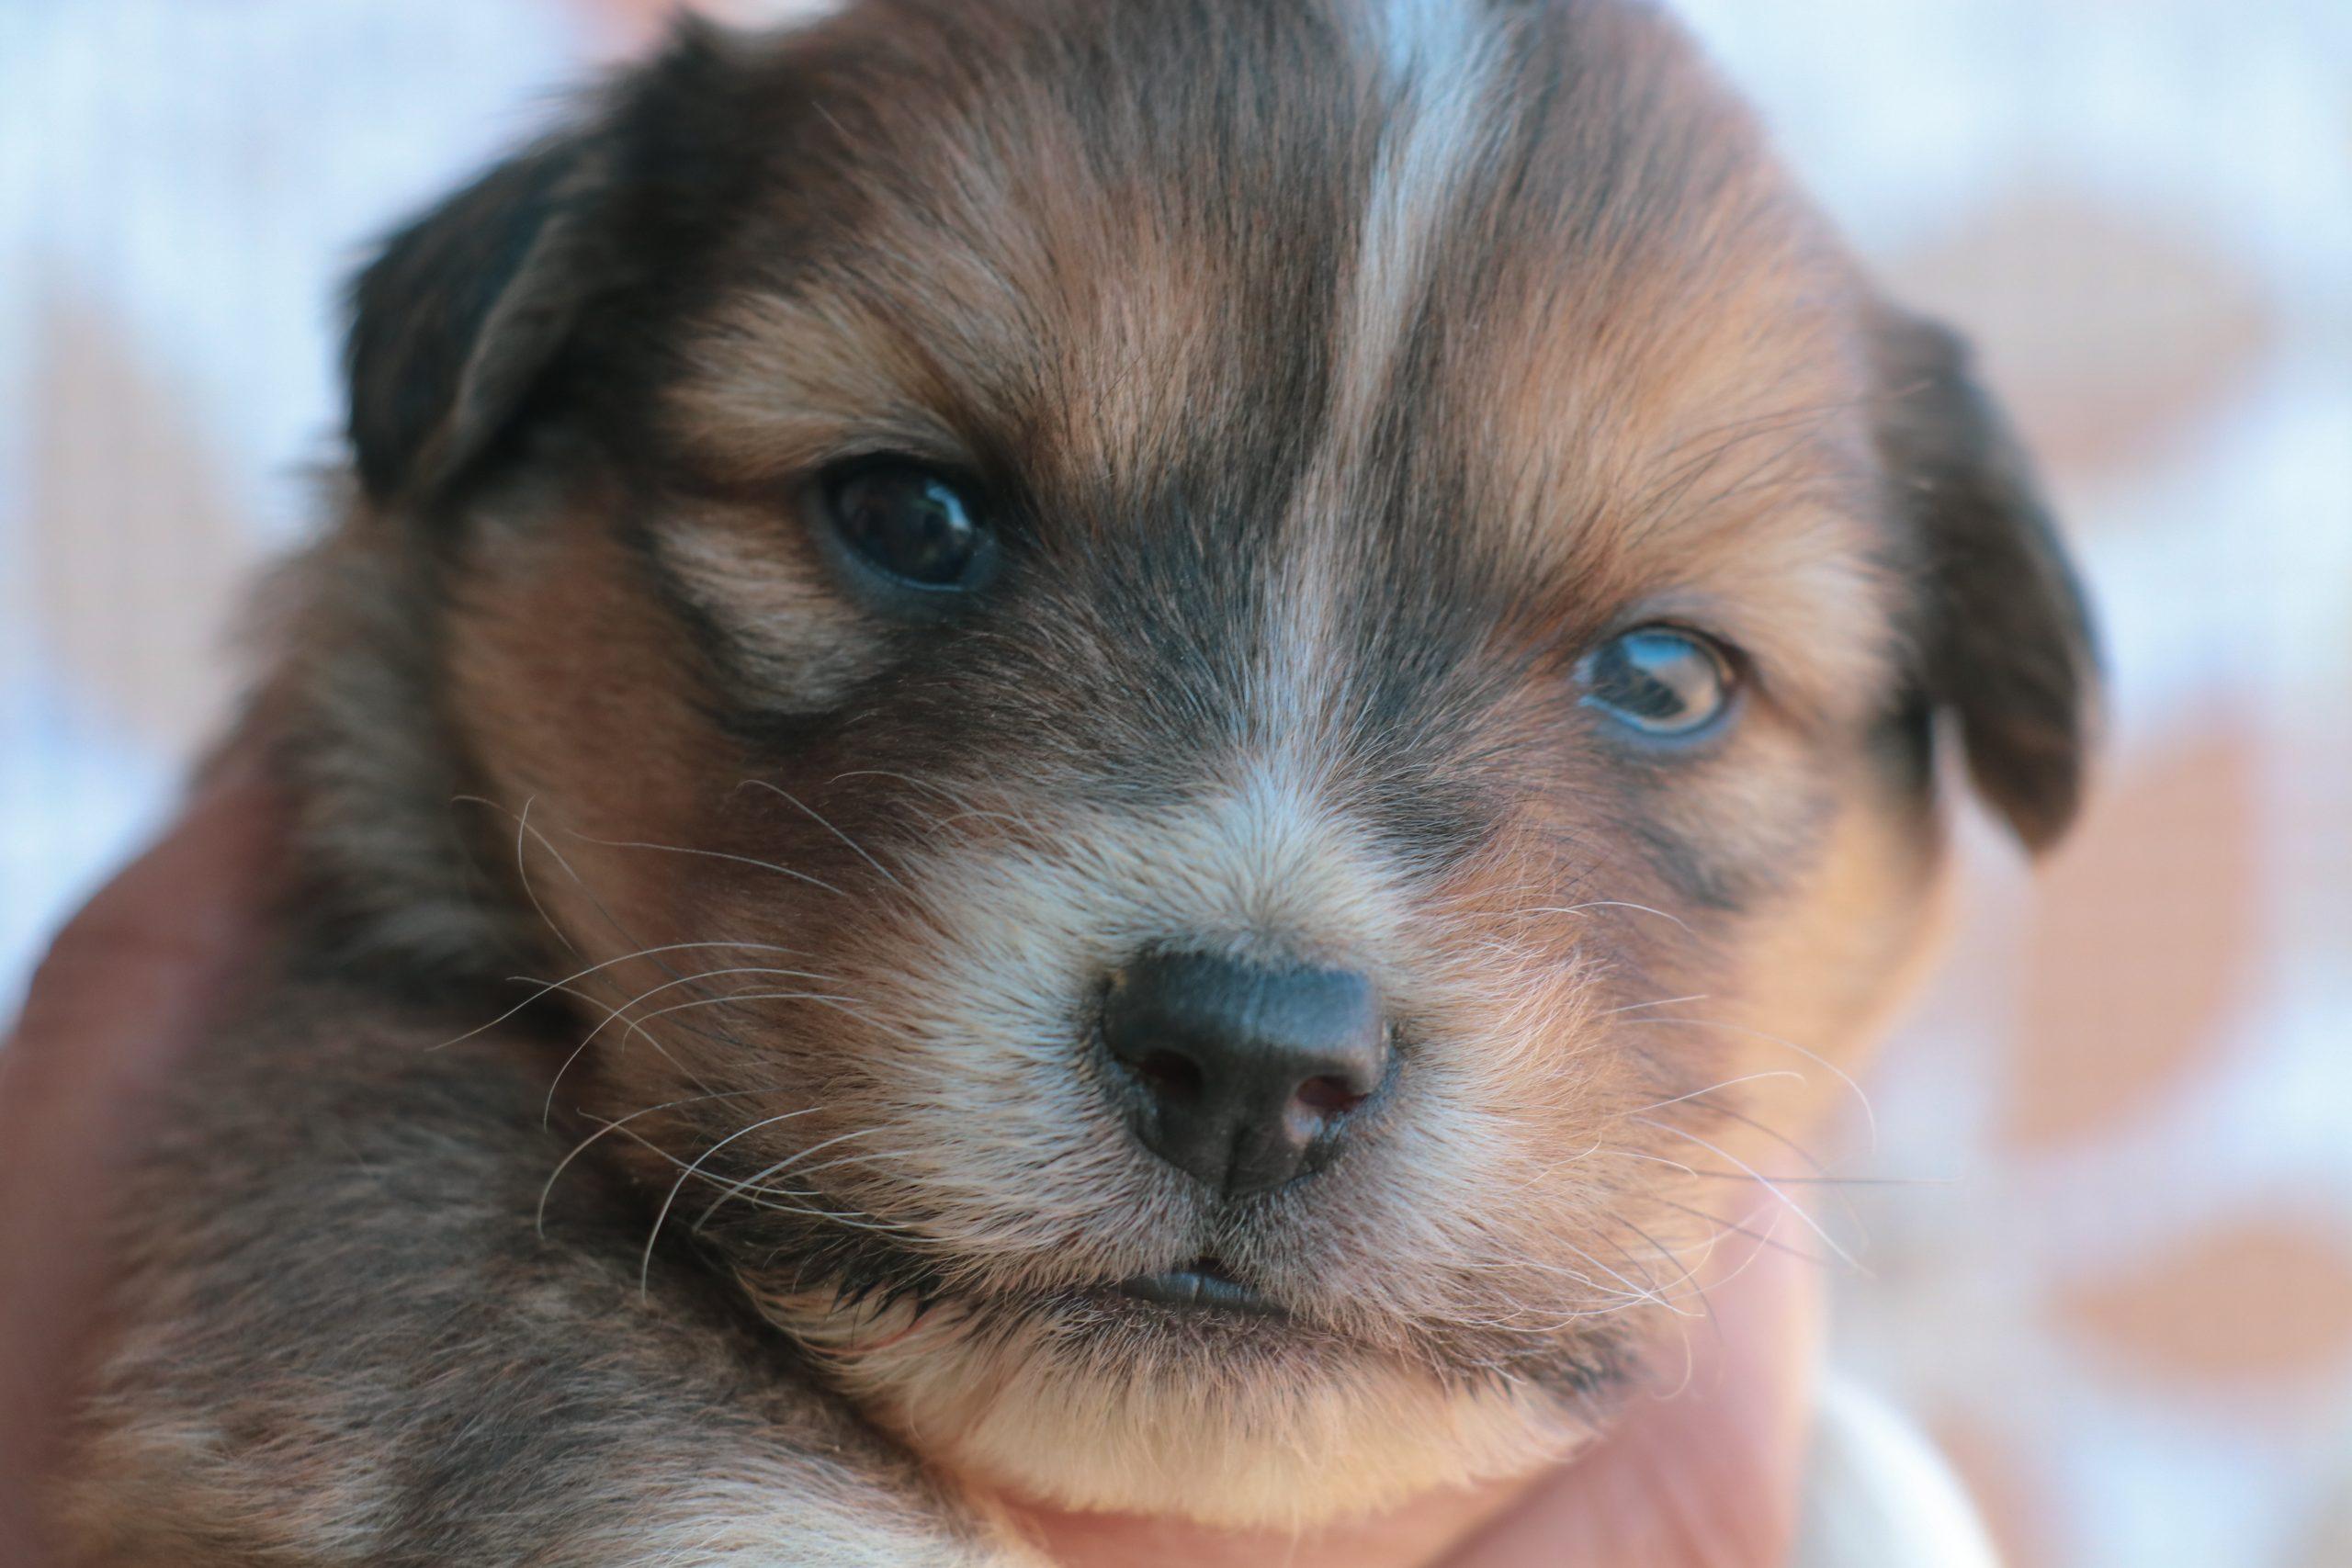 A baby dog